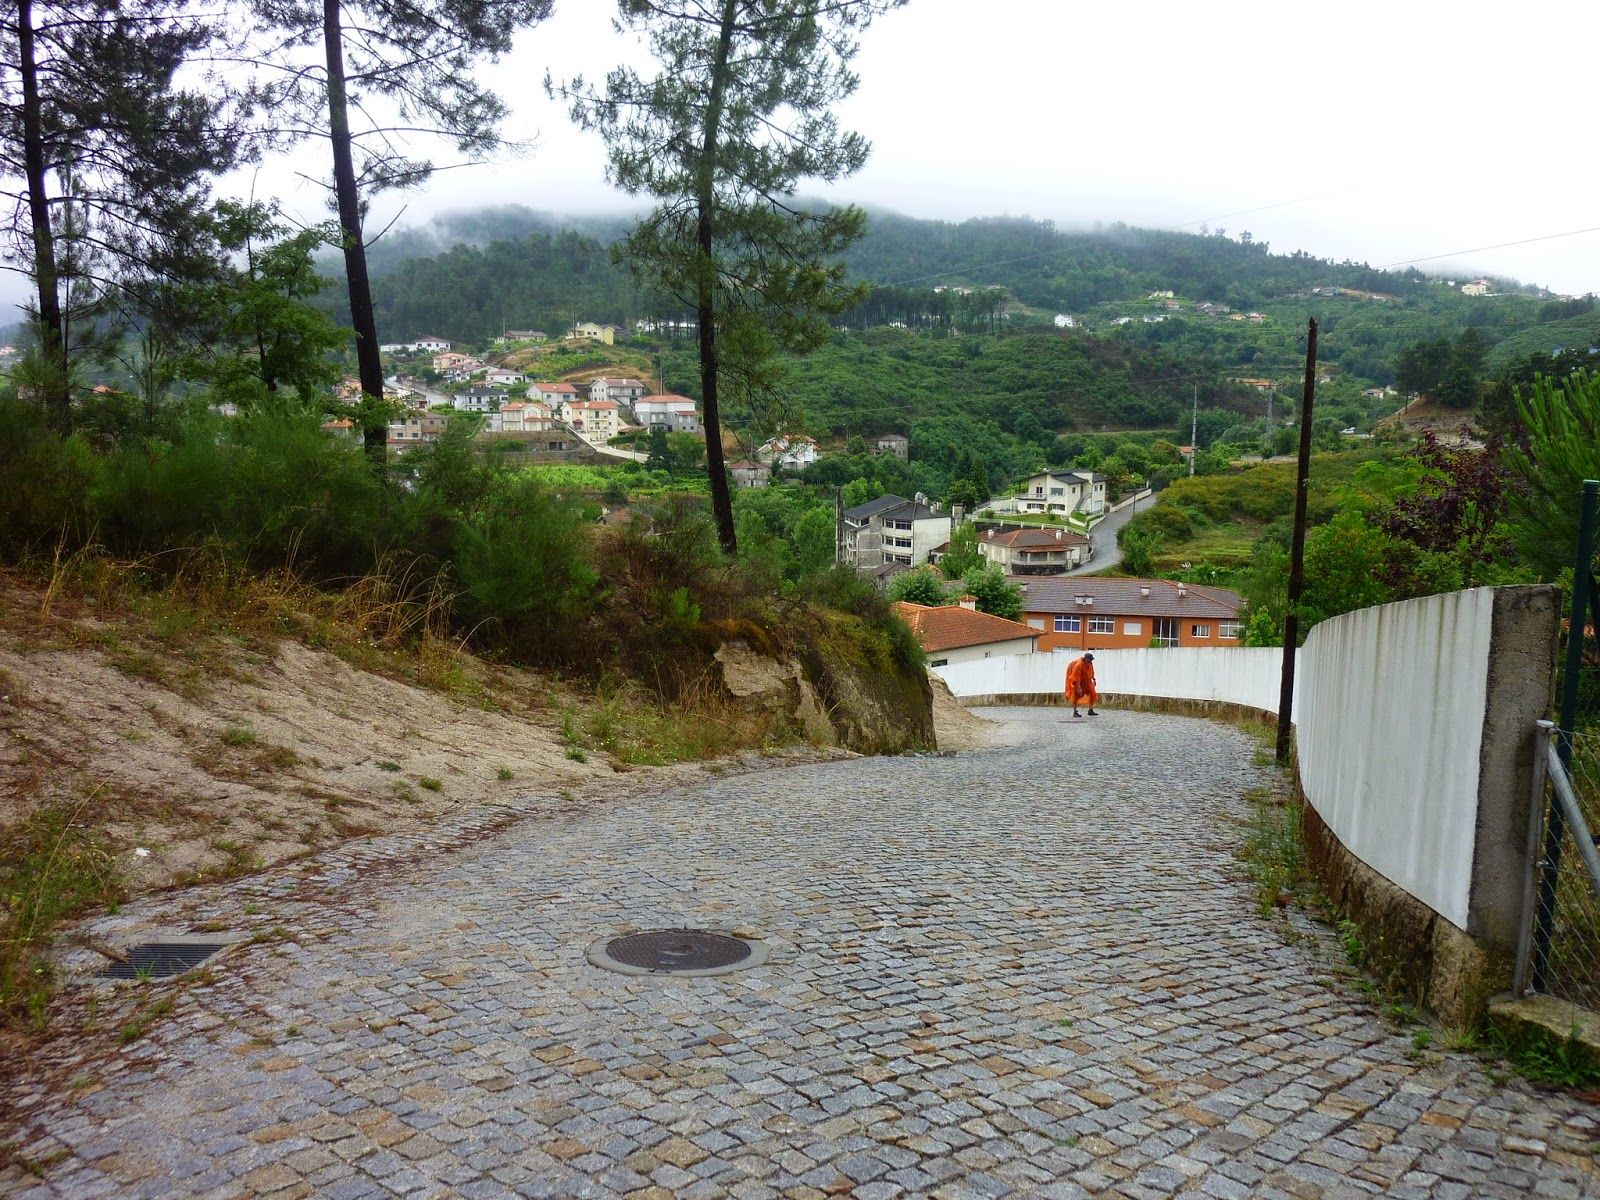 Su strade e sentieri camino torres 12 tappa carneiro for Camino sul ponte rialzato